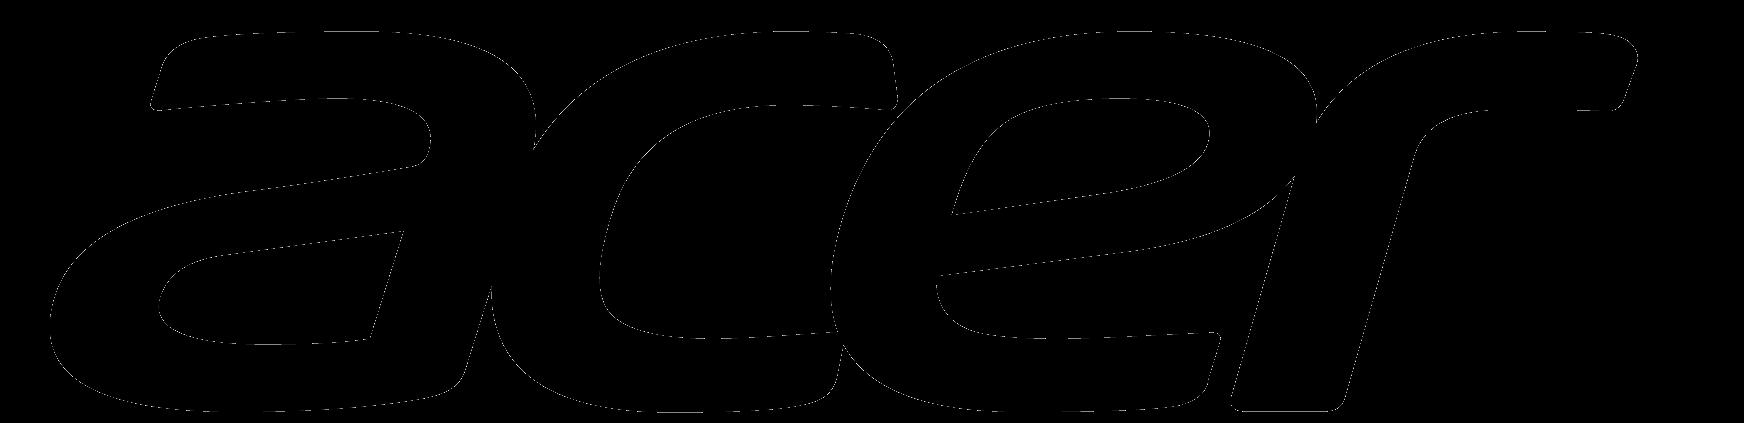 kisspng-laptop-acer-aspire-computer-logo-lenovo-logo-5acb2ccf280490.5697144415232647191639